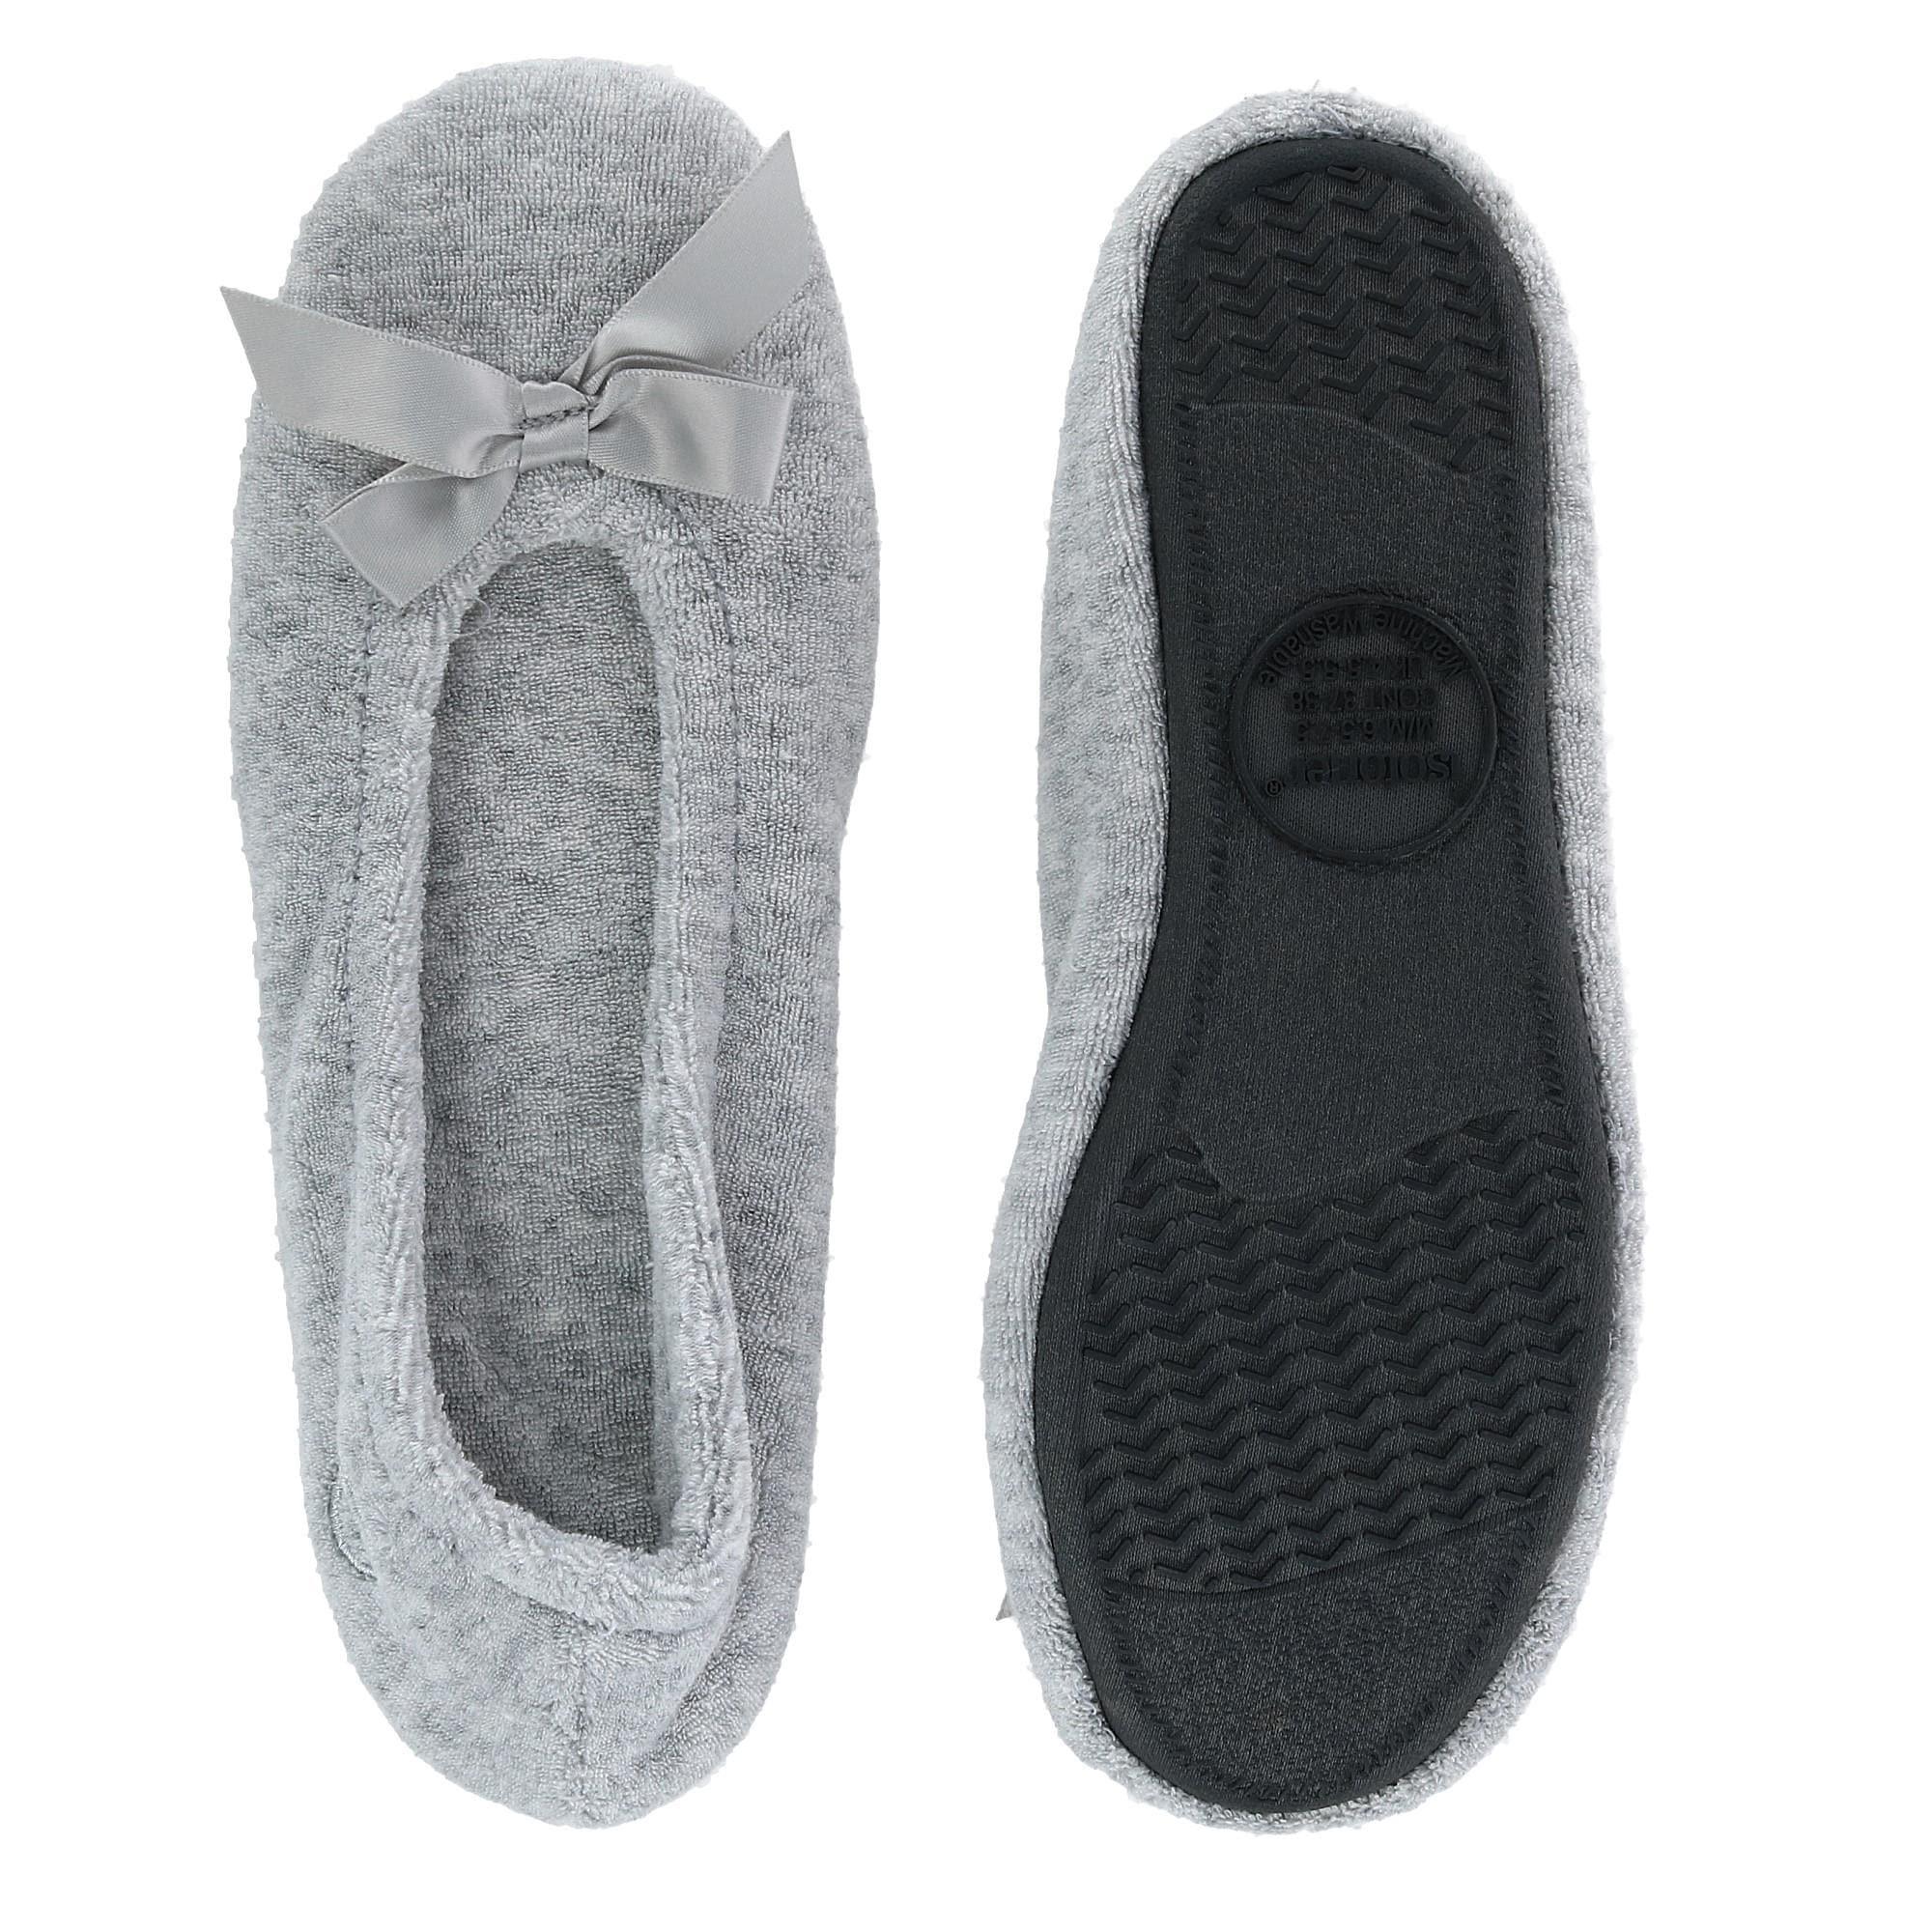 buy online 5502e c7f88 Isotoner Women's Terry Classic Ballerina Slippers